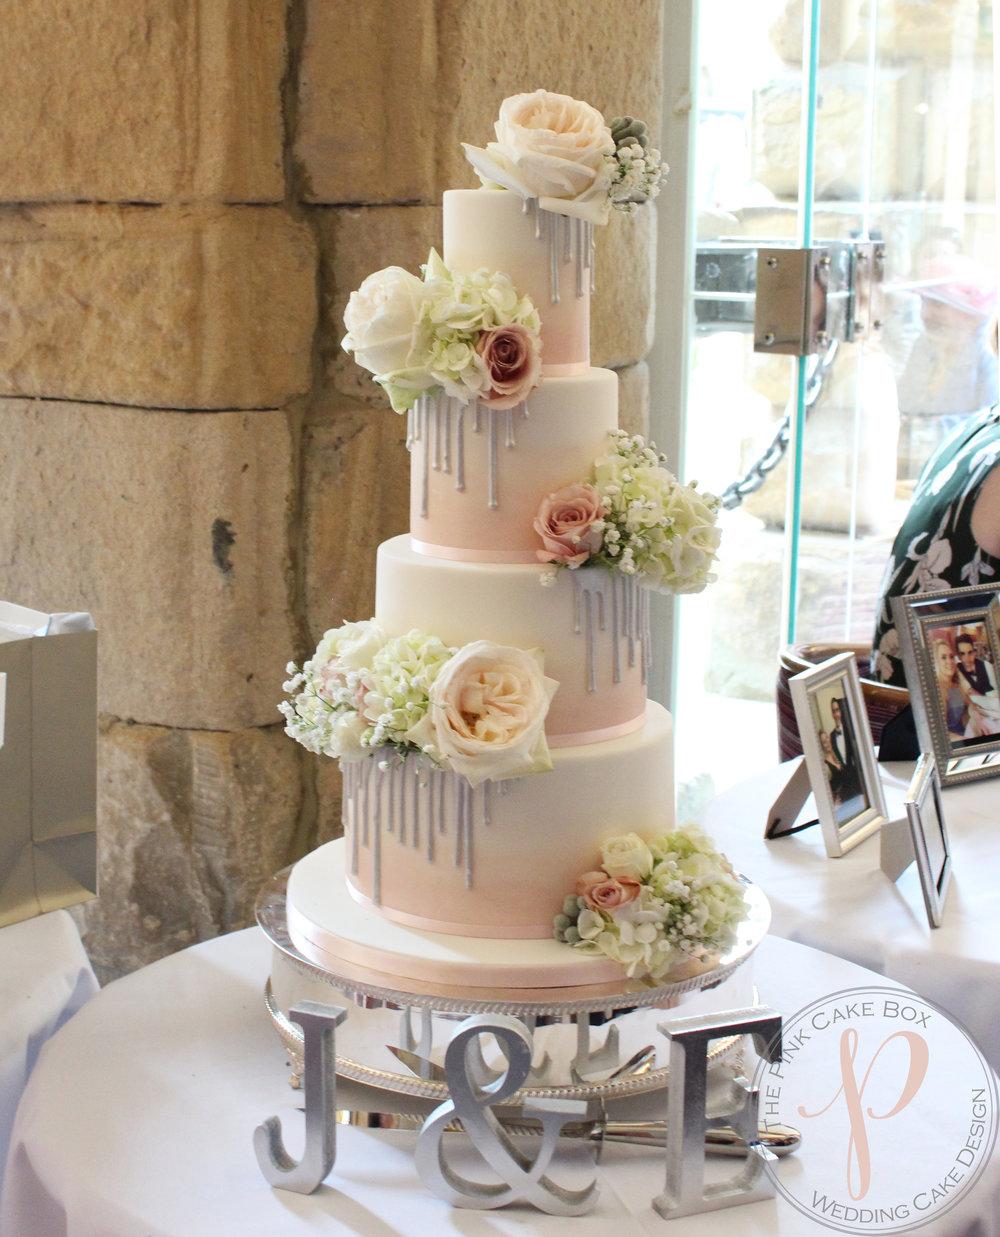 blush ombre wedding cake with metallic drips.jpg